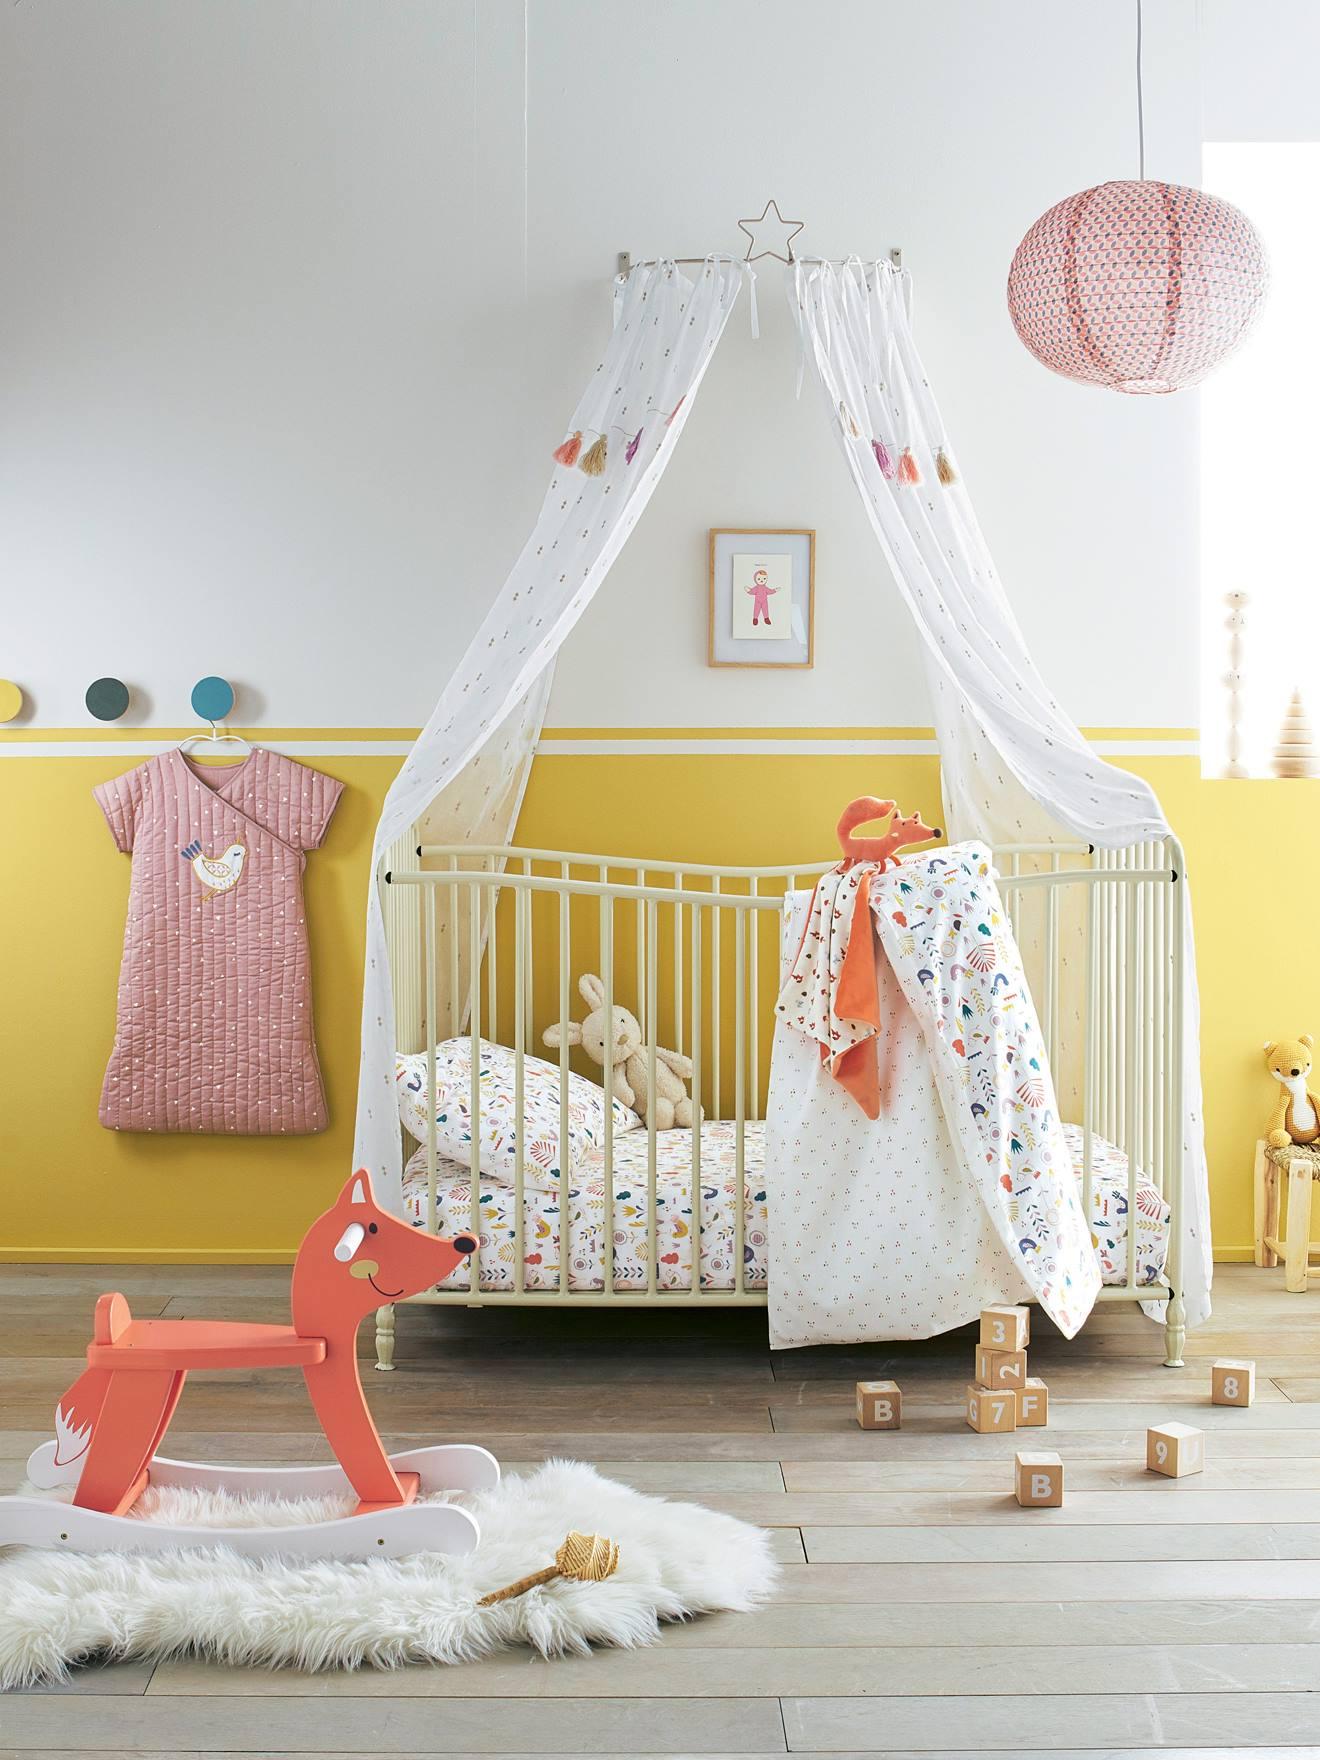 vertbaudet lit bebe lit bb romantique barreaux blanc vertbaudet enfant with vertbaudet lit bebe. Black Bedroom Furniture Sets. Home Design Ideas